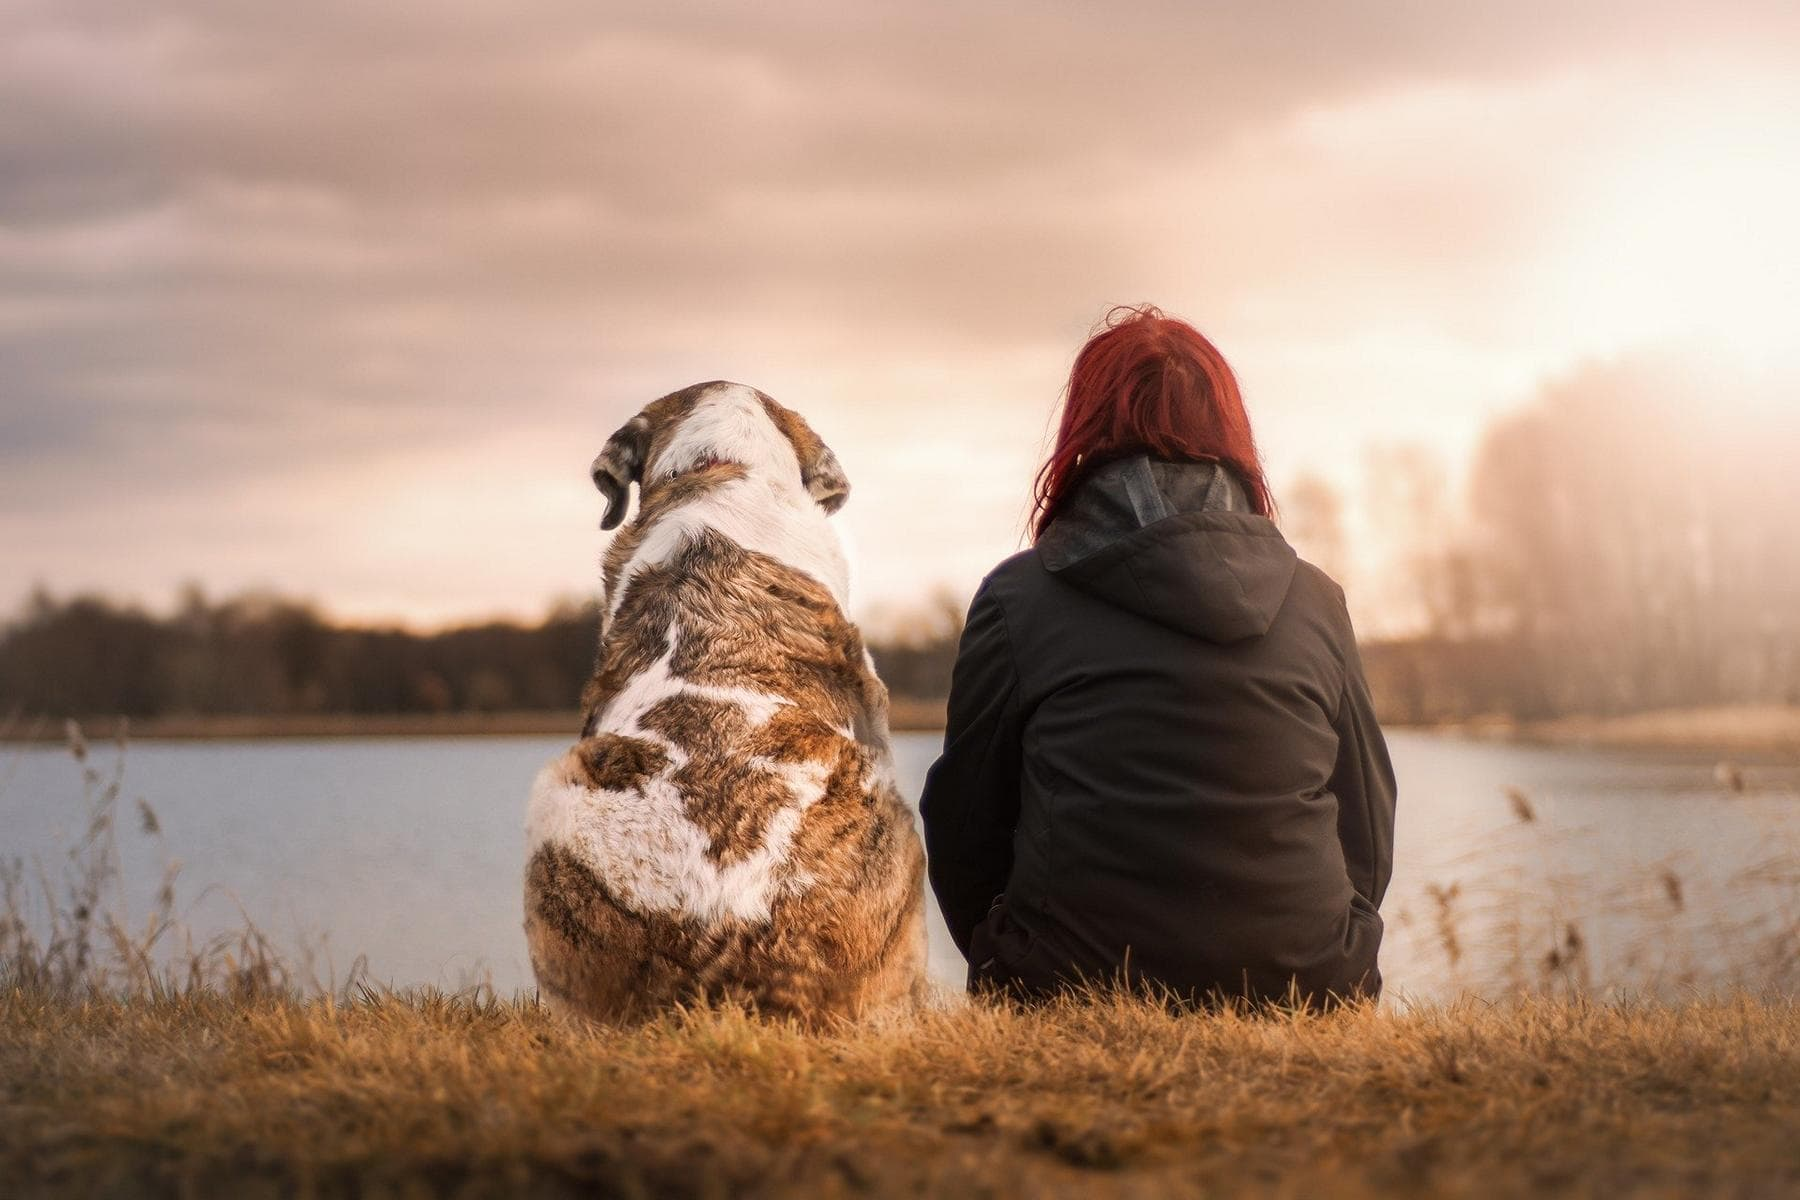 BGH-News: Kündigung des Mietverhältnisses wegen freilaufender Hunde